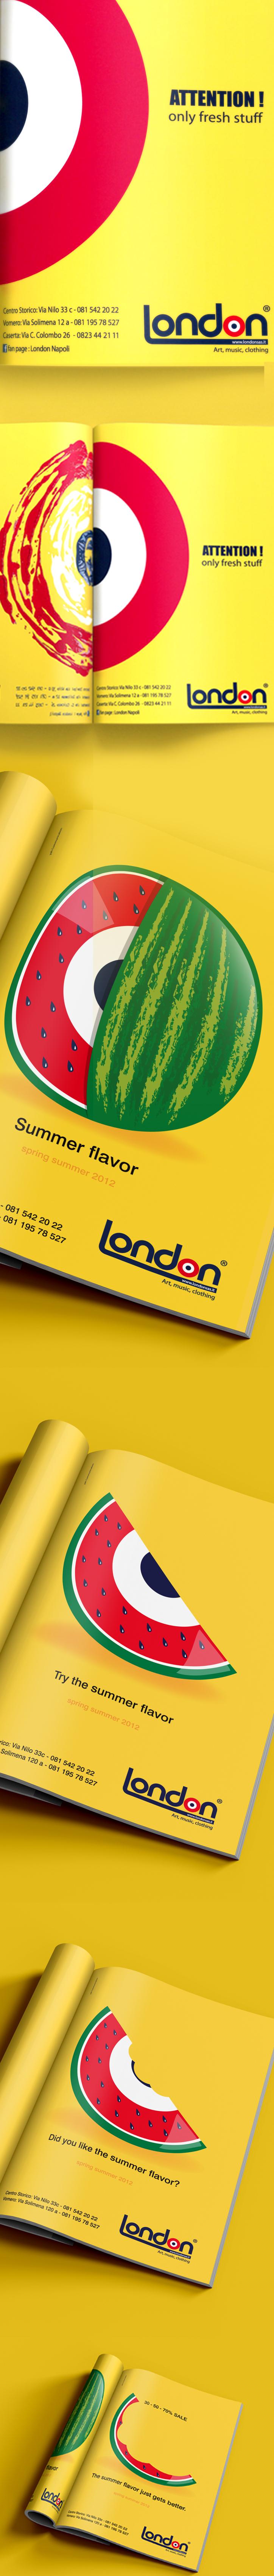 London_napoli on Behance